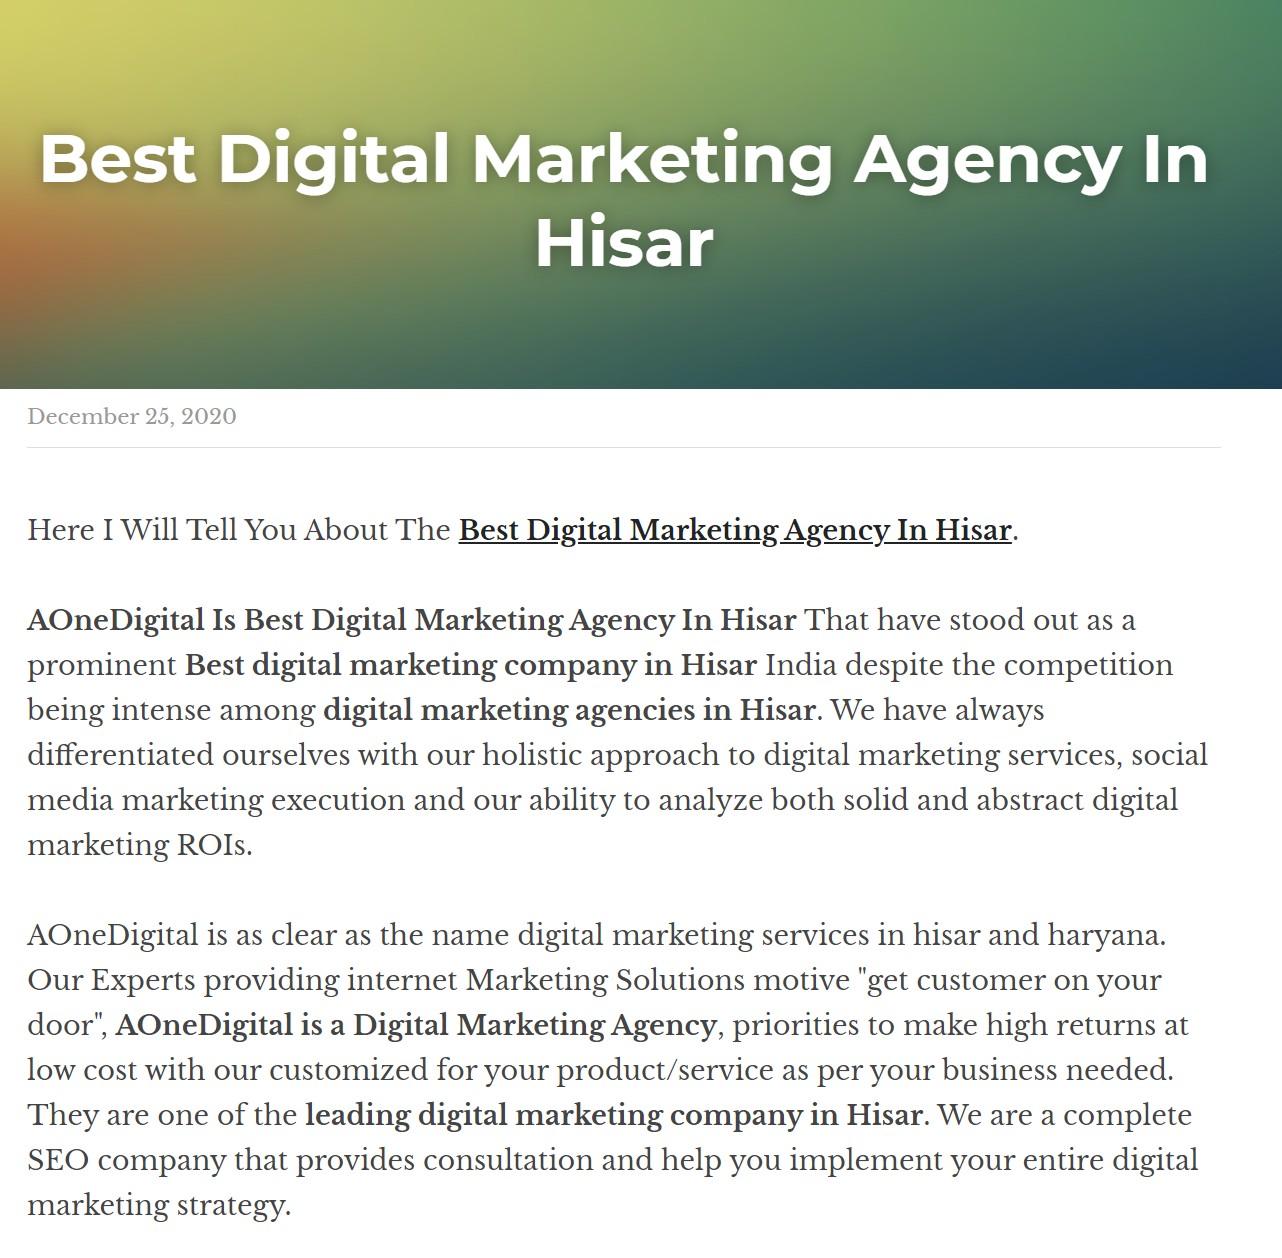 Best Digital Marketing Agency In Hisar